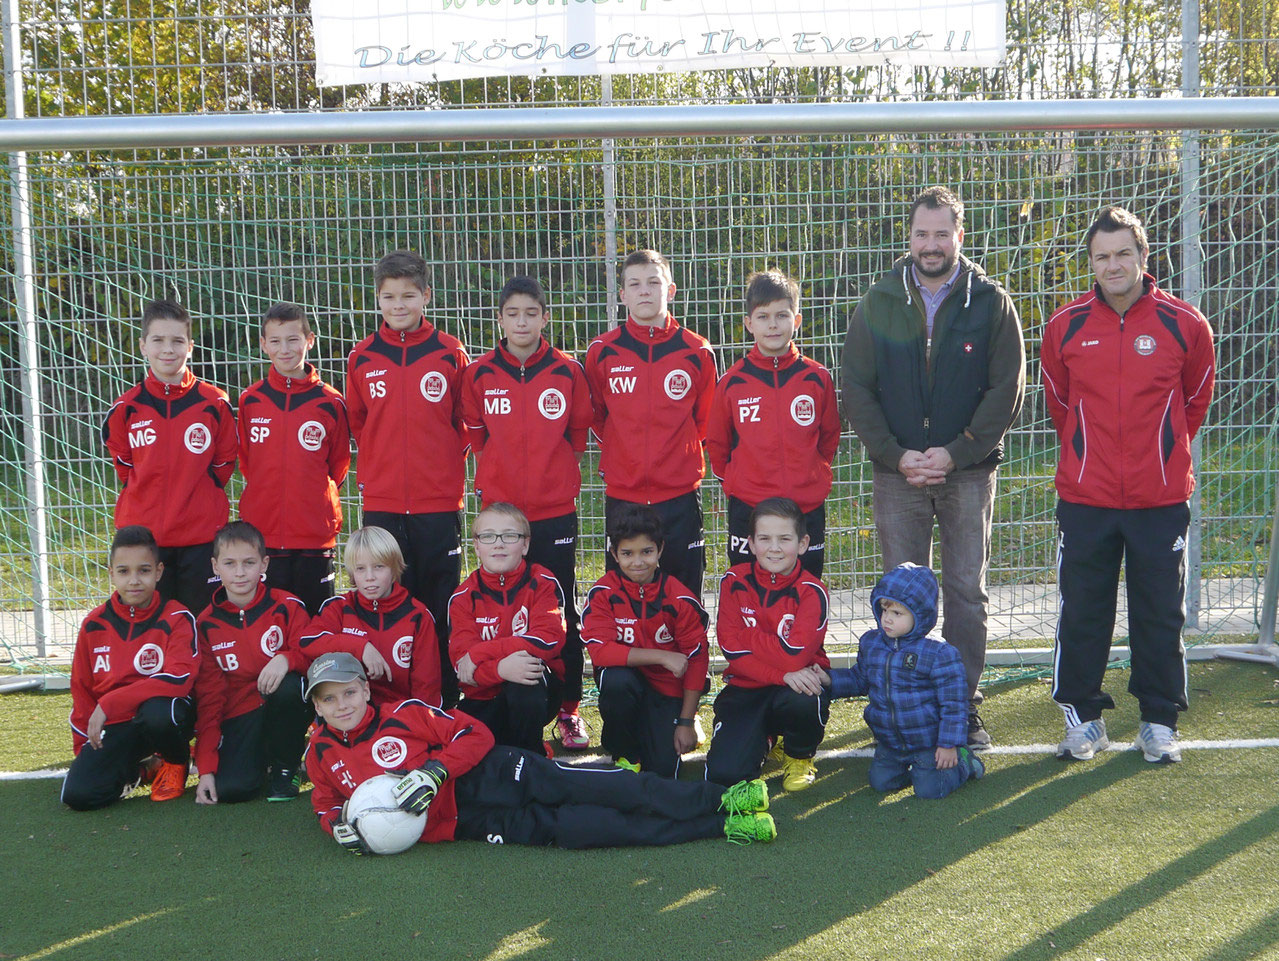 D3-Junioren (U13) Saison 2013/14 - 1. FC Niederkassel 1920/2010 e.V.